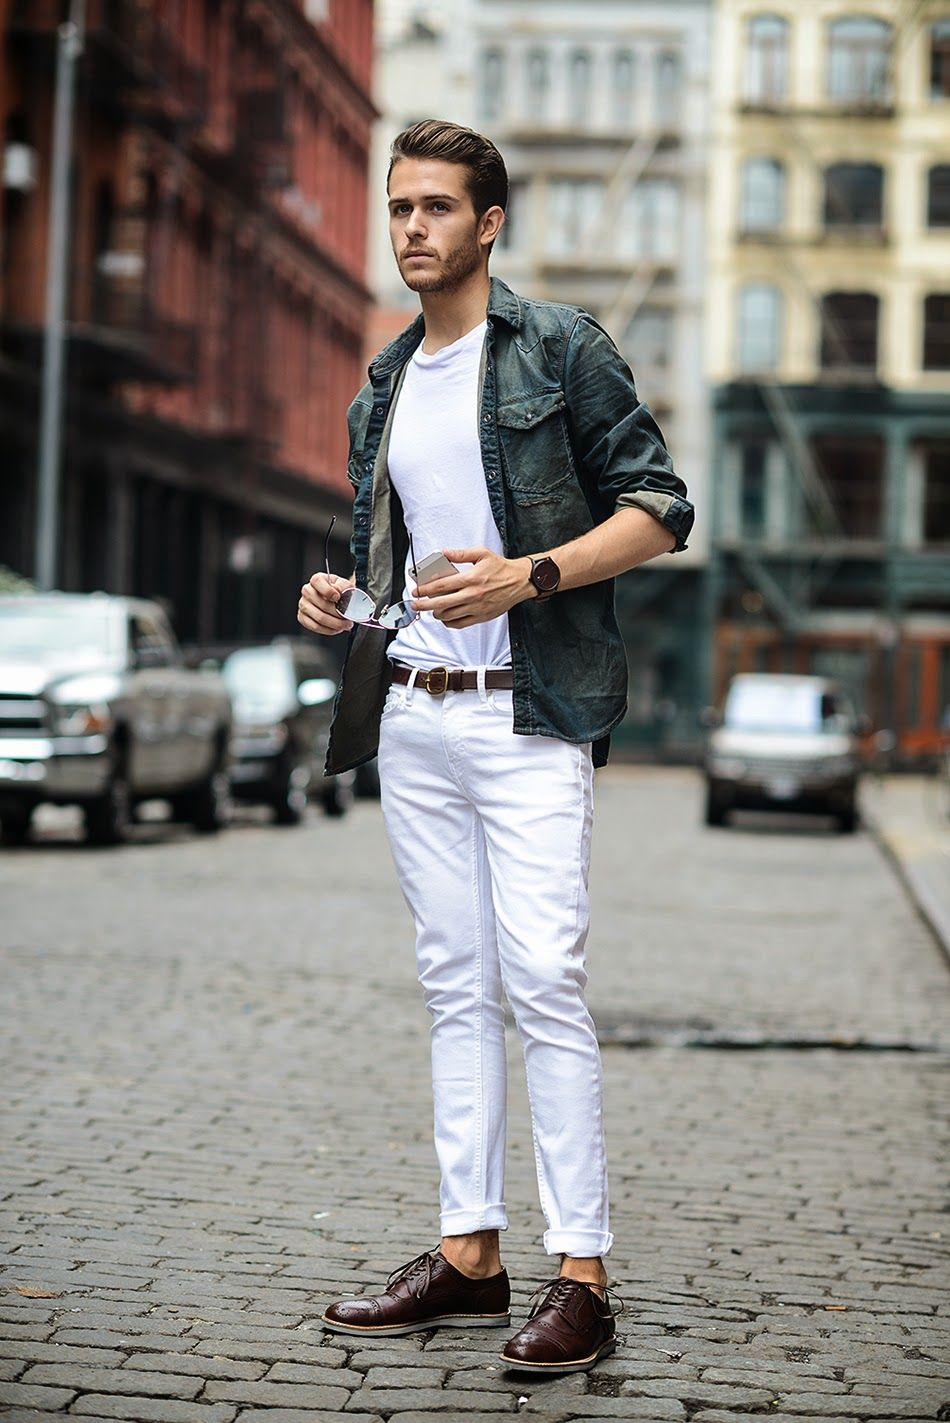 8a52142925 fashion  mensfashion  menswear  mensstyle  style  outfit  ootd ...